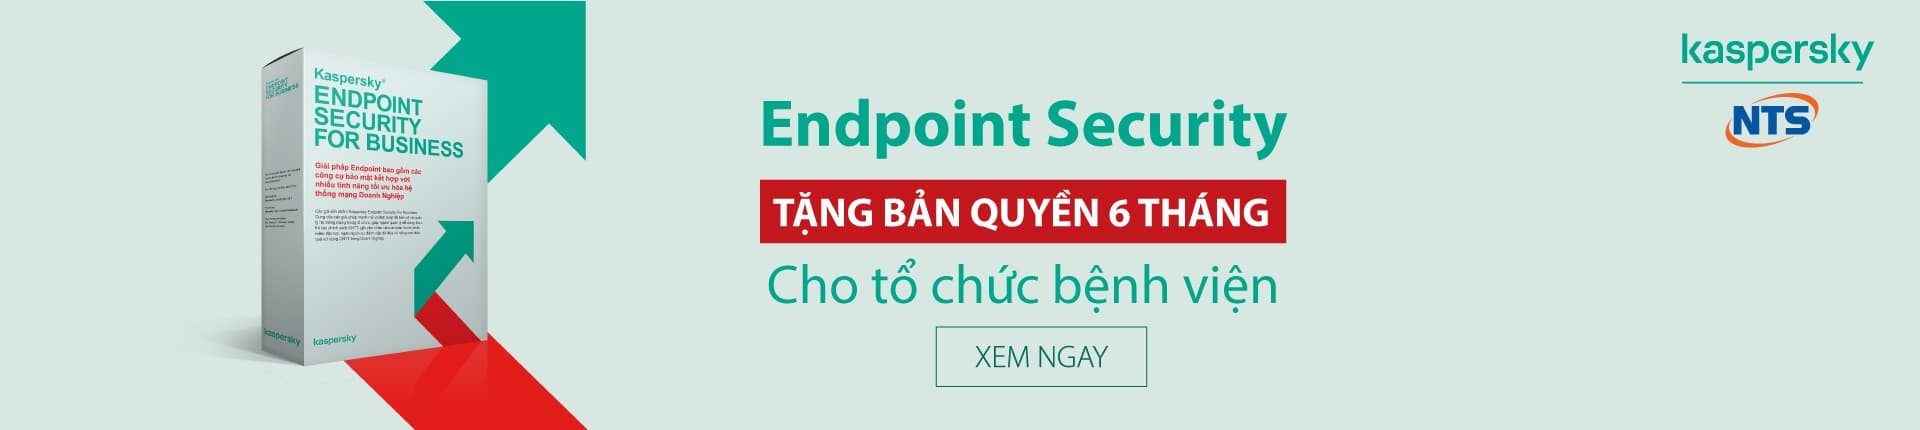 Mua Kaspersky Small Office Security tặng Acronis T